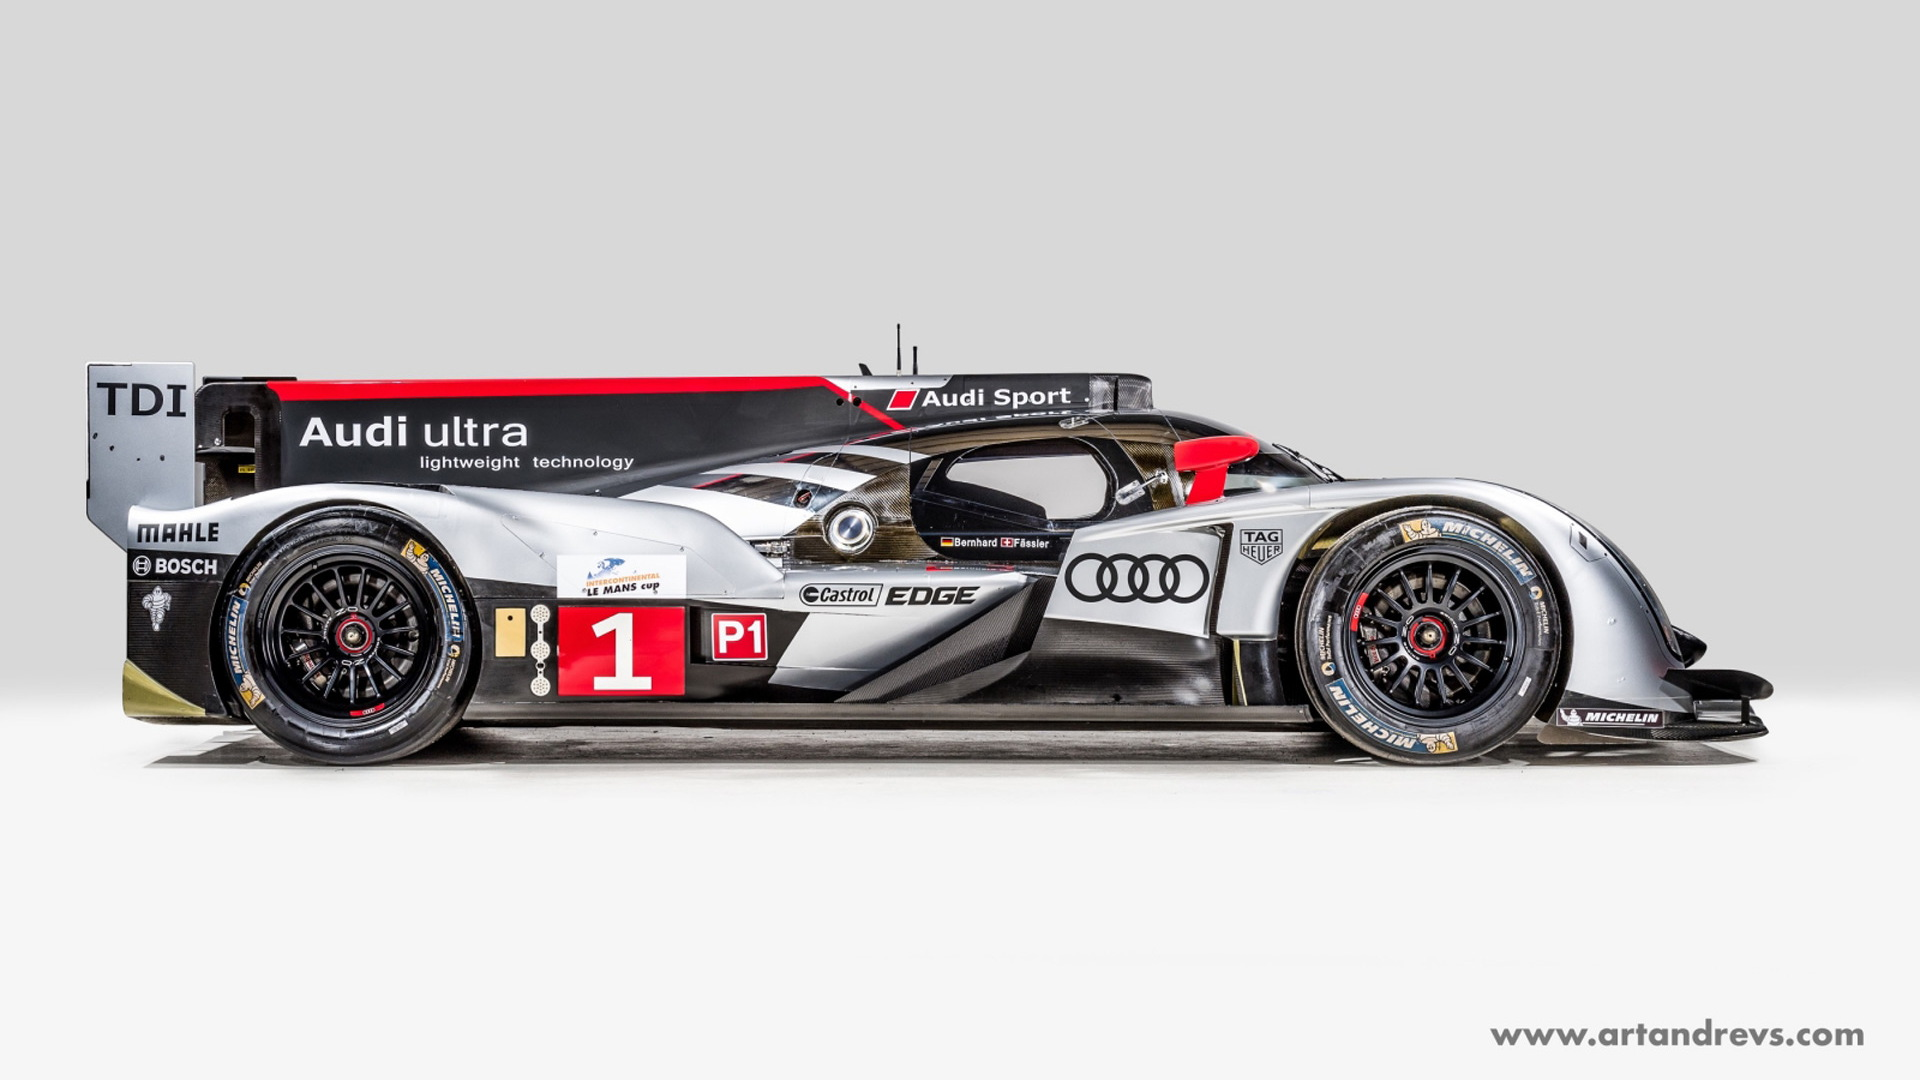 2011 Audi R18 TDI Ultra LMP1 race car - Photo credit: Art & Revs